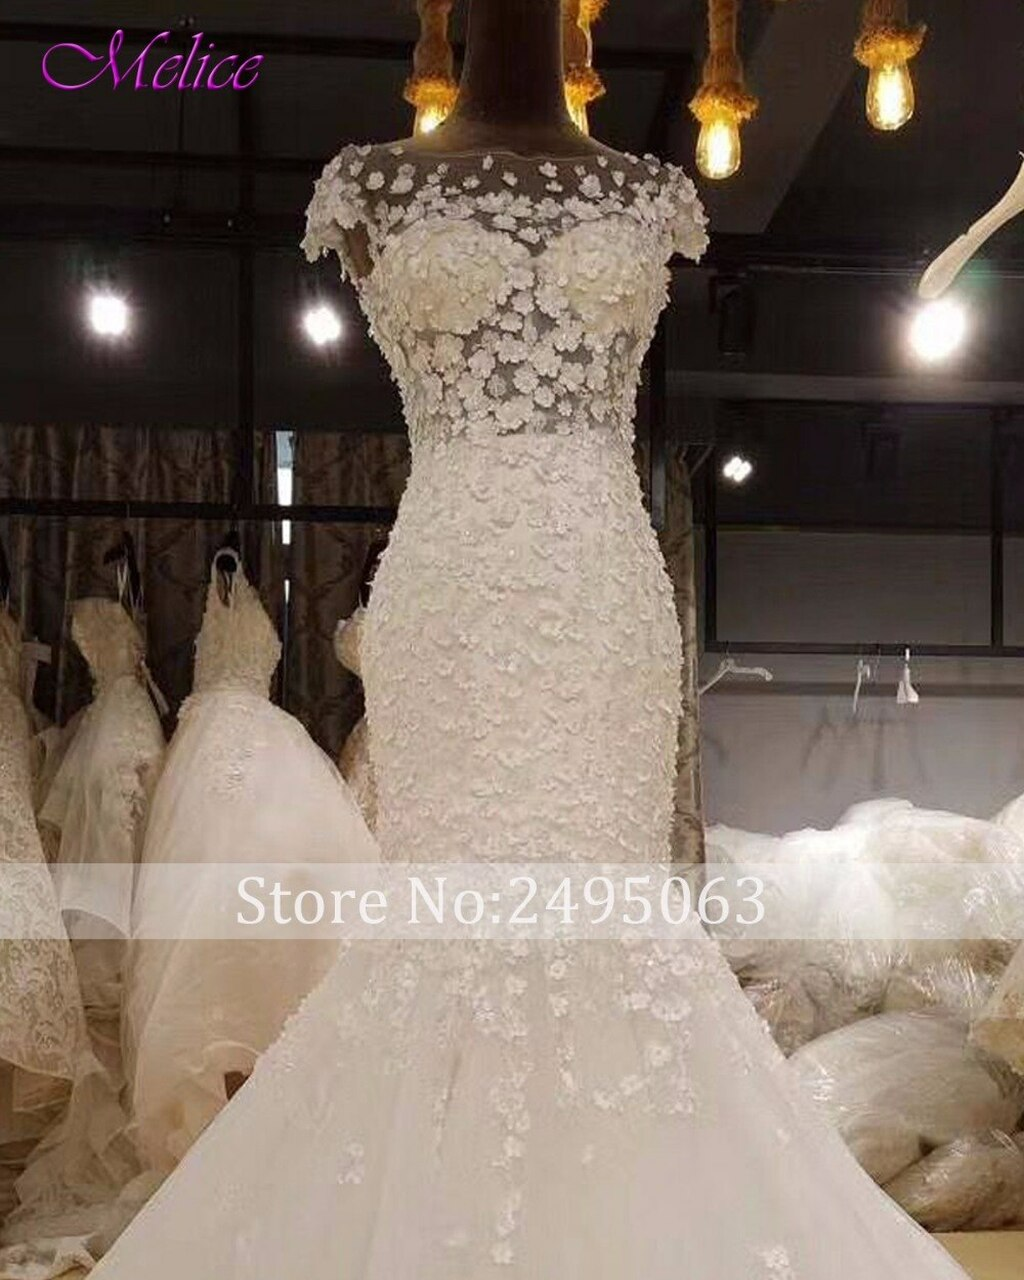 305ada4d9f Fmogl Glamorous Appliques Cap Sleeve Mermaid Wedding Dress 2019 Vintage  Scoop Neck Trumpet Bride Gown Robe De Mariage Plus Size